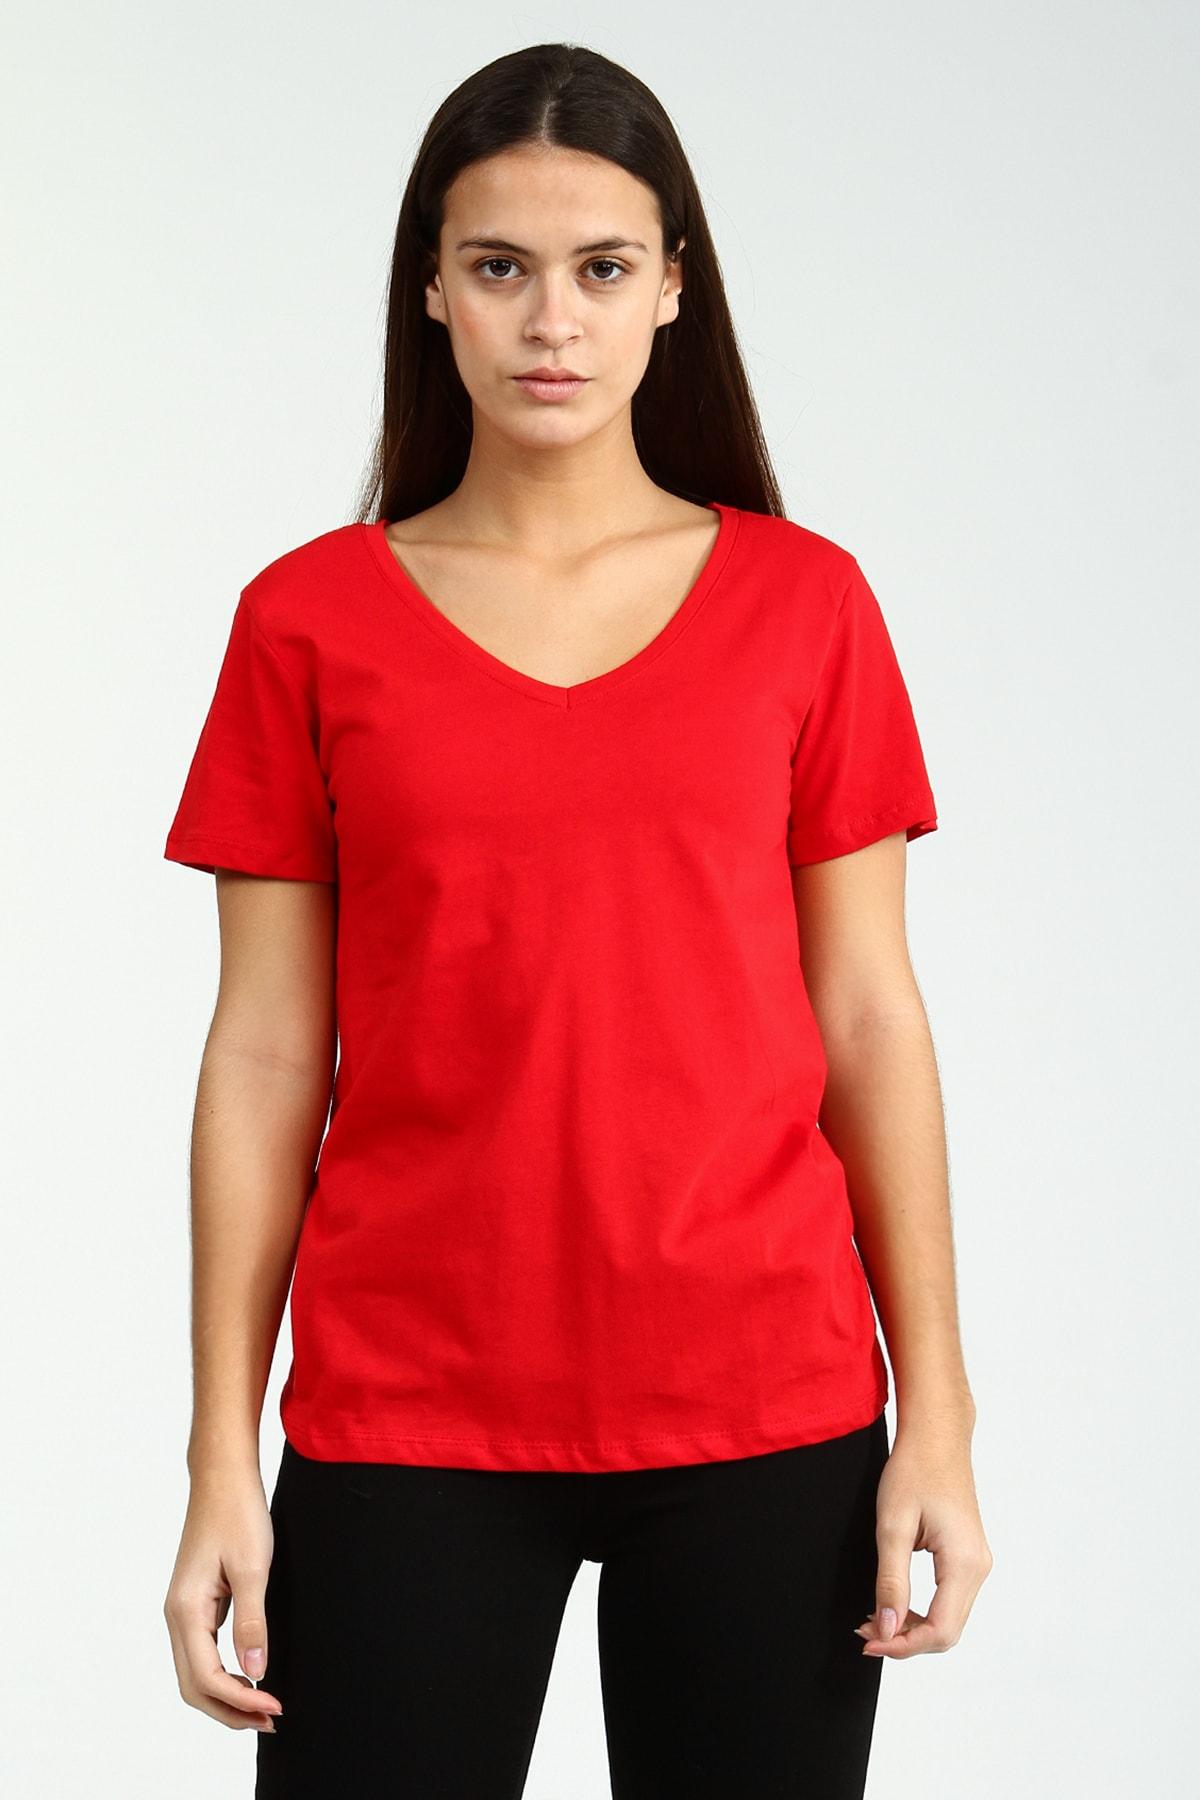 Collezione Kırmızı V Yakalı Kısa Kollu Basic Kadın Tshirt 2